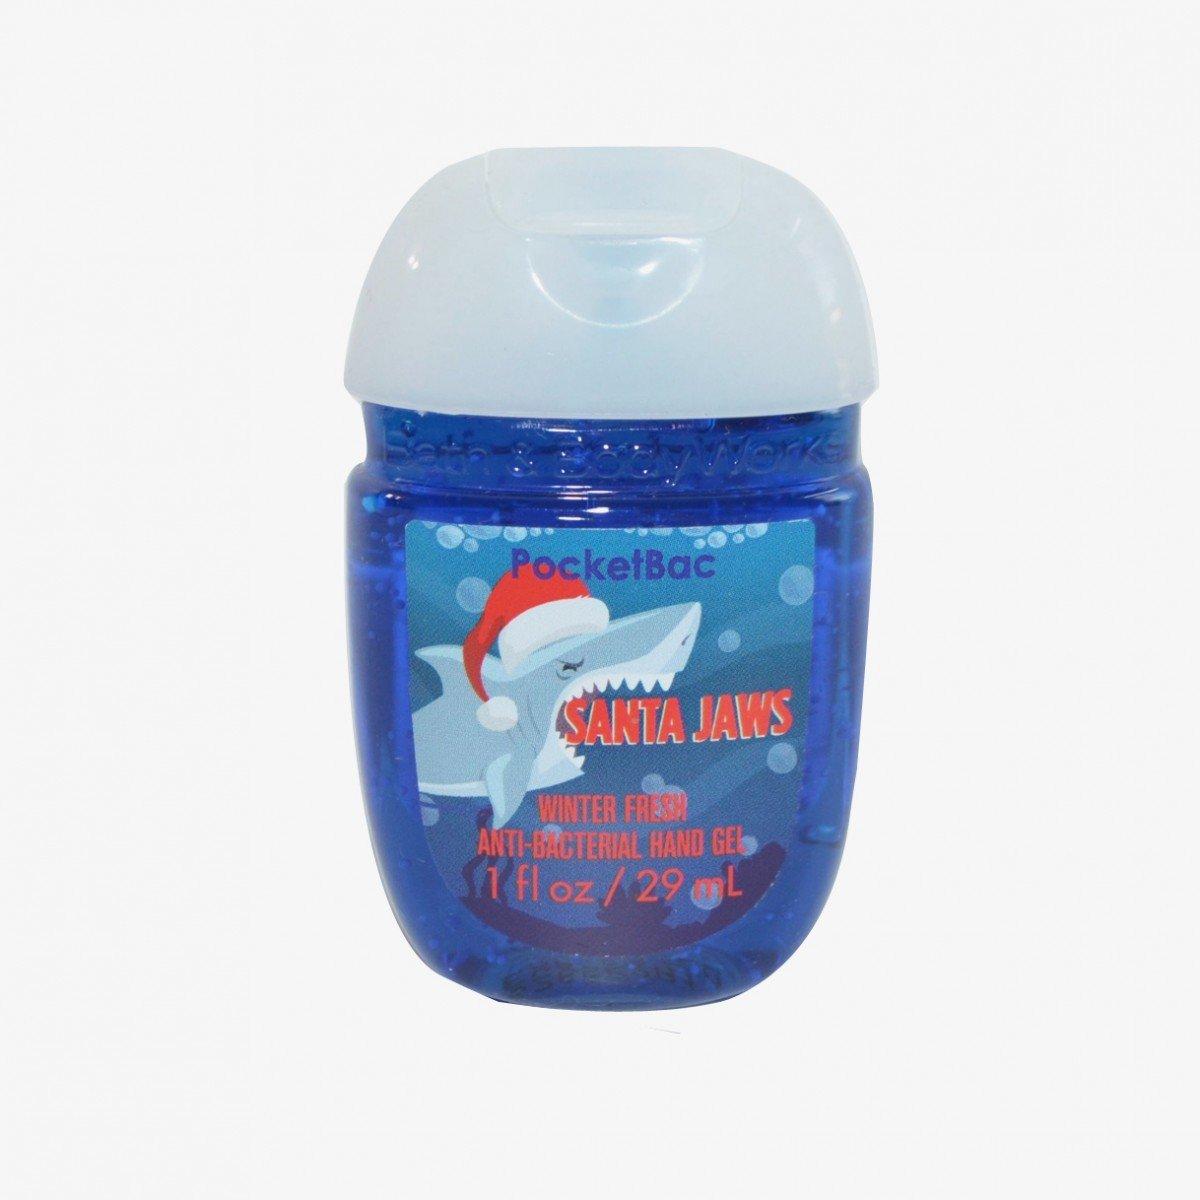 Amazon.com : Bath & Body Works PocketBac Hand Gel Sanitizer Santa ...